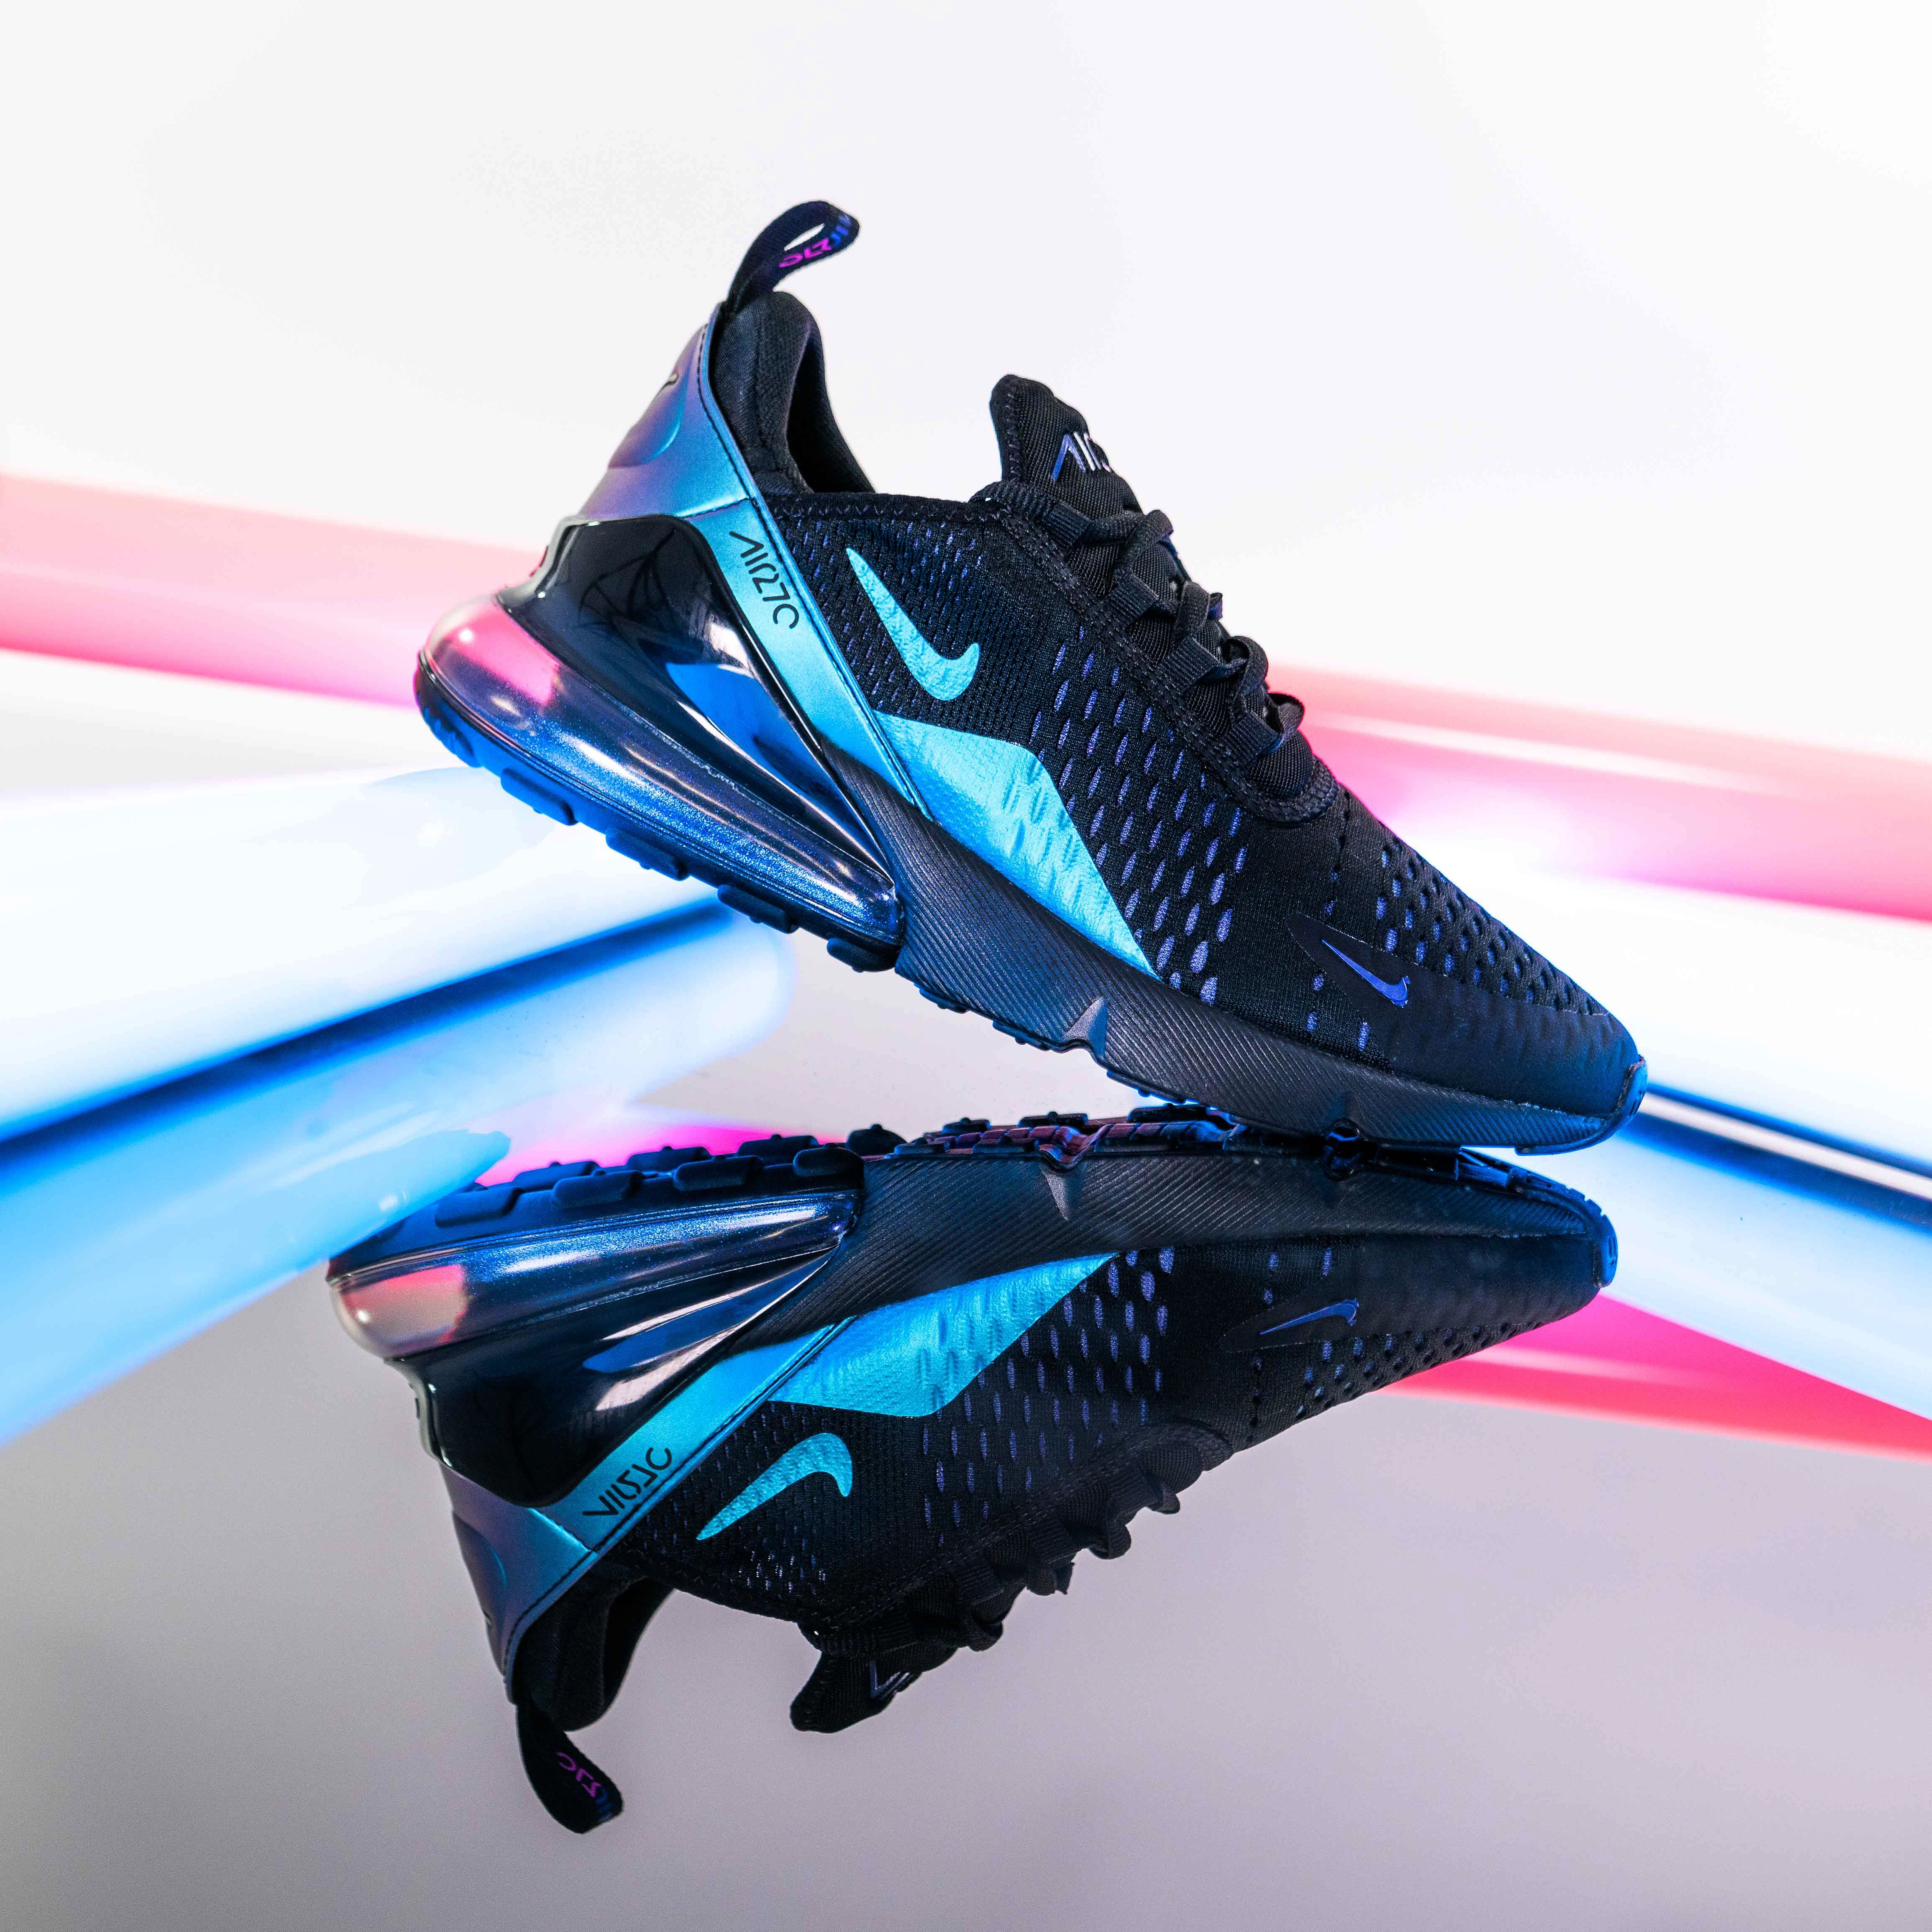 Nike Air Max 270 Throwback Future Black Nike Shoes Blue Black Nike Shoes Nike Air Max